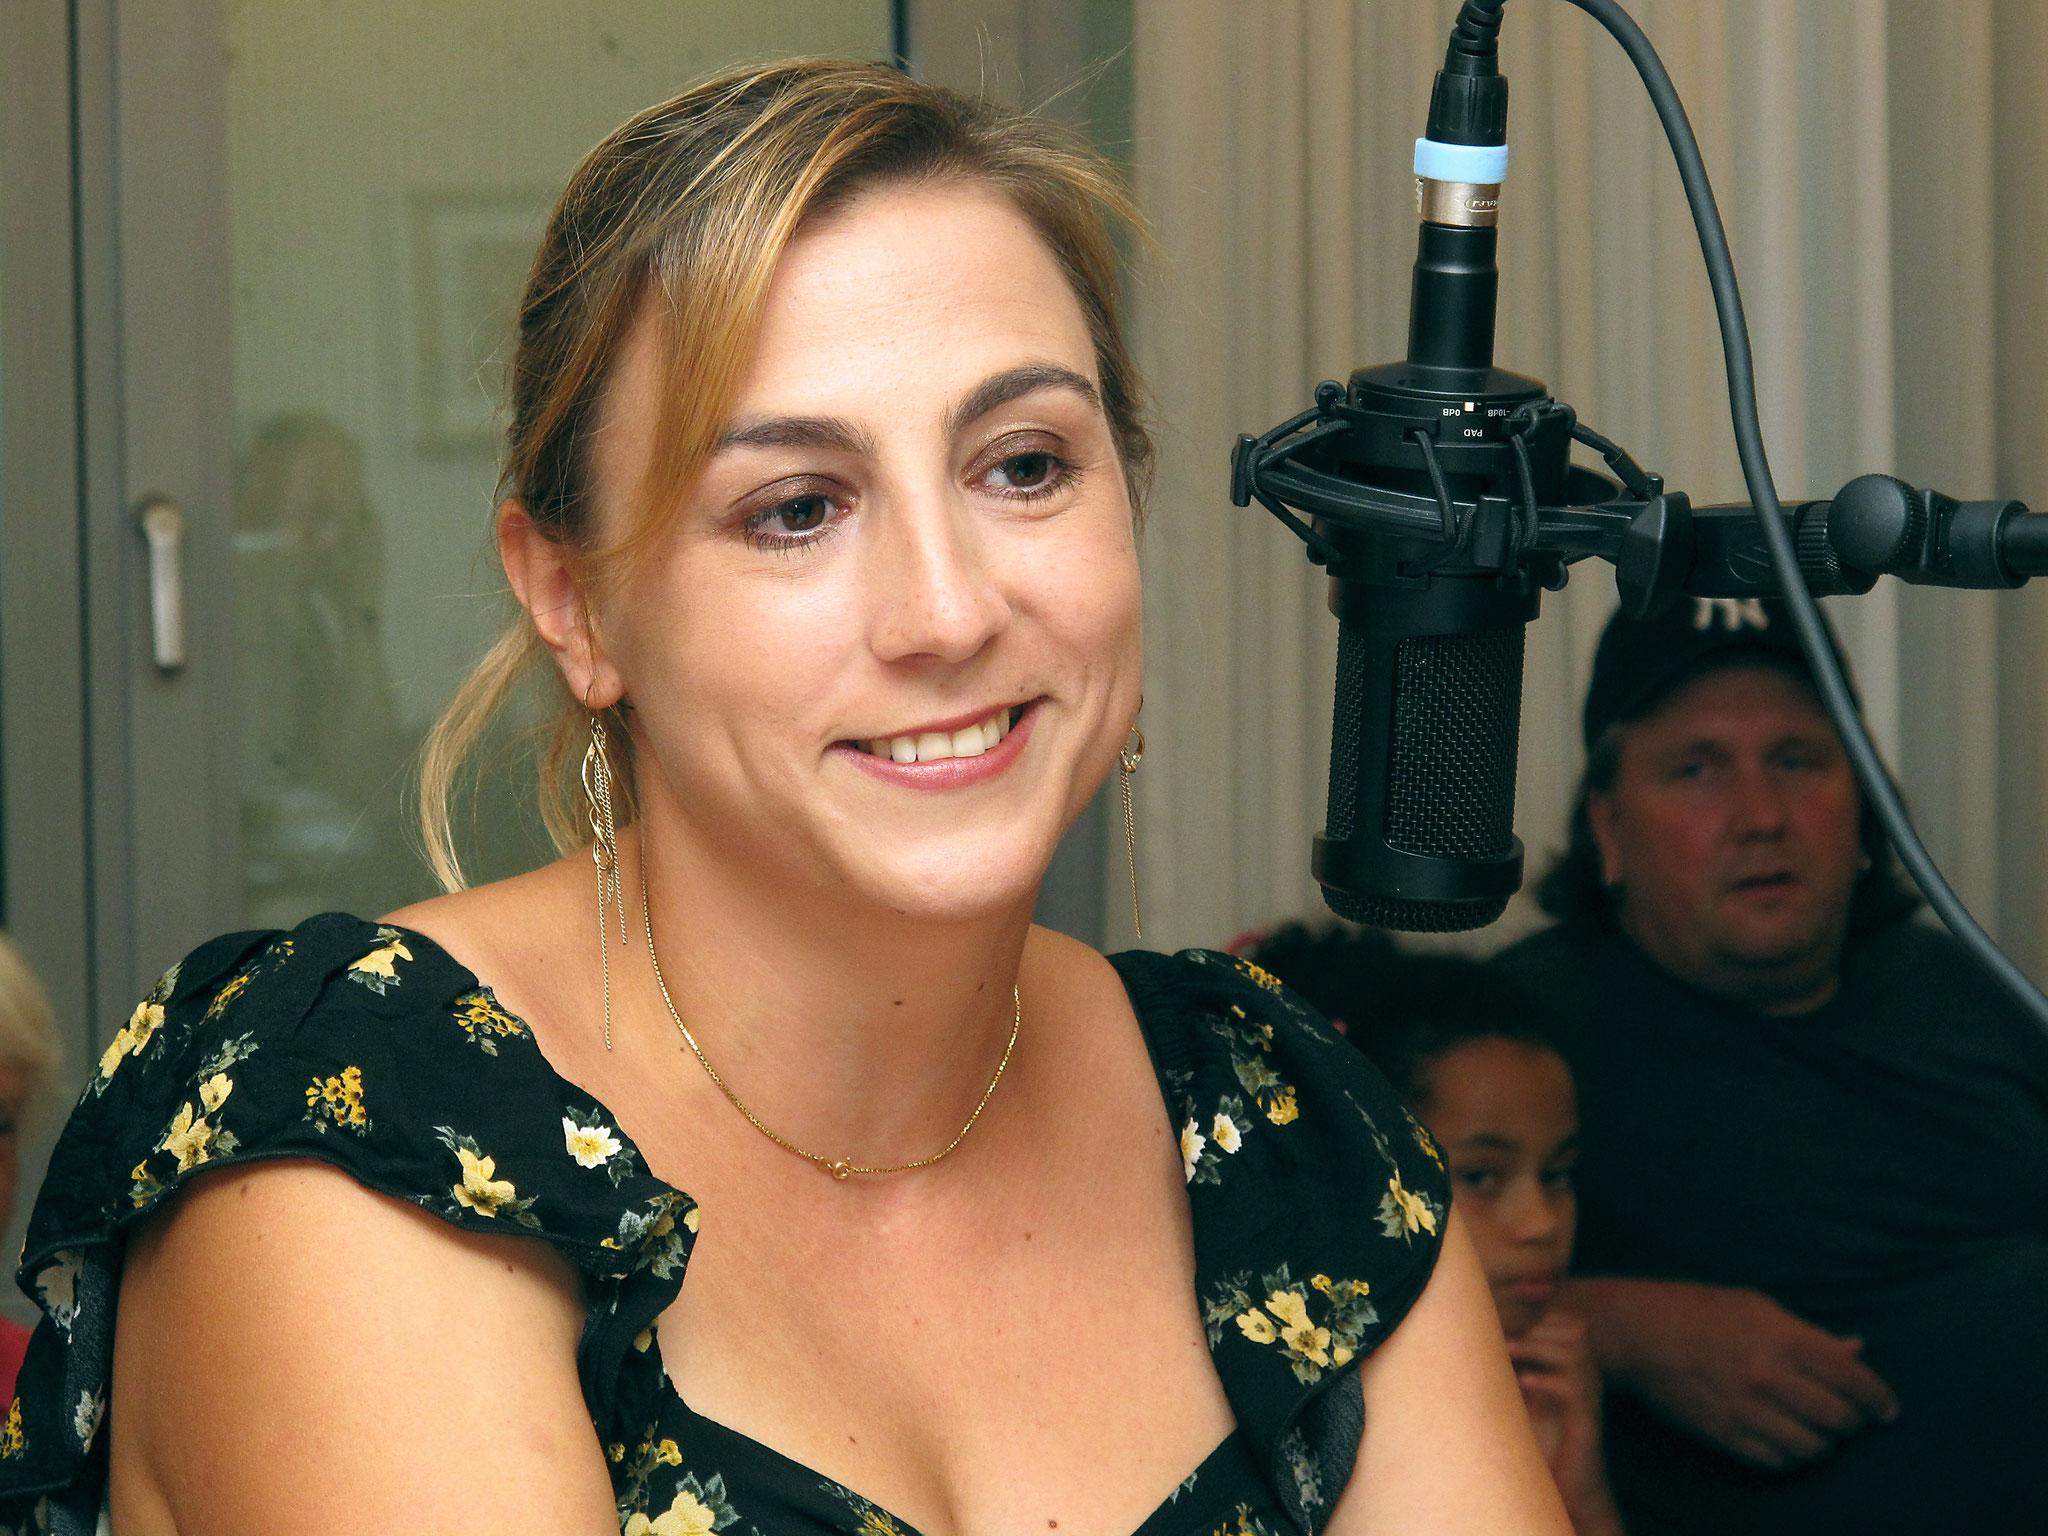 Carlyn, Sängerin aus dem Seeland